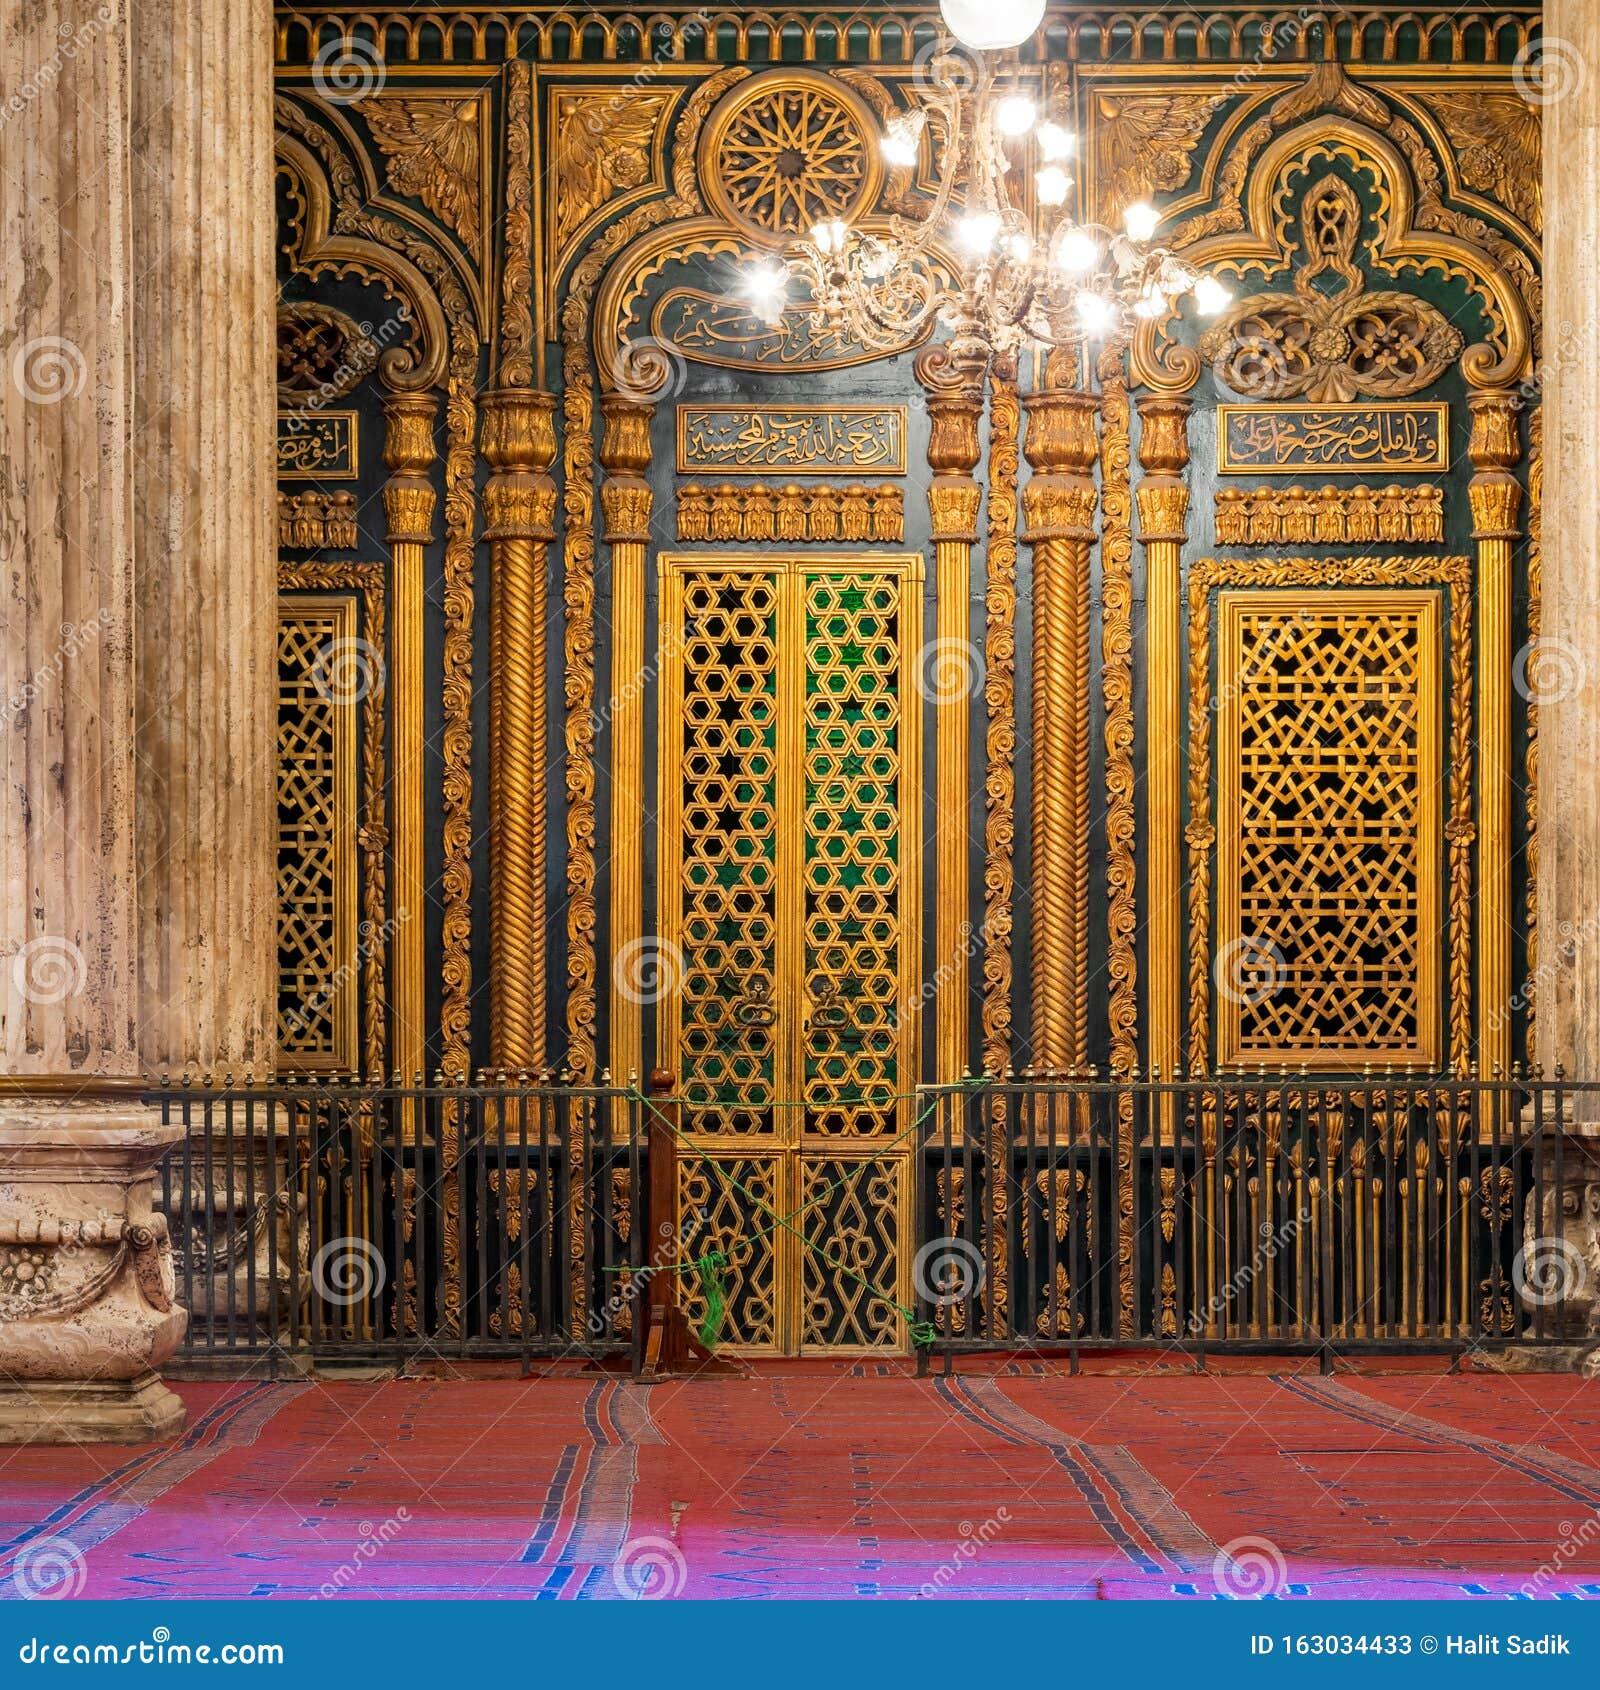 Shrine of Muhammad Ali with golden decorations, Mosque of Muhammad Ali, Citadel of Cairo, Egypt